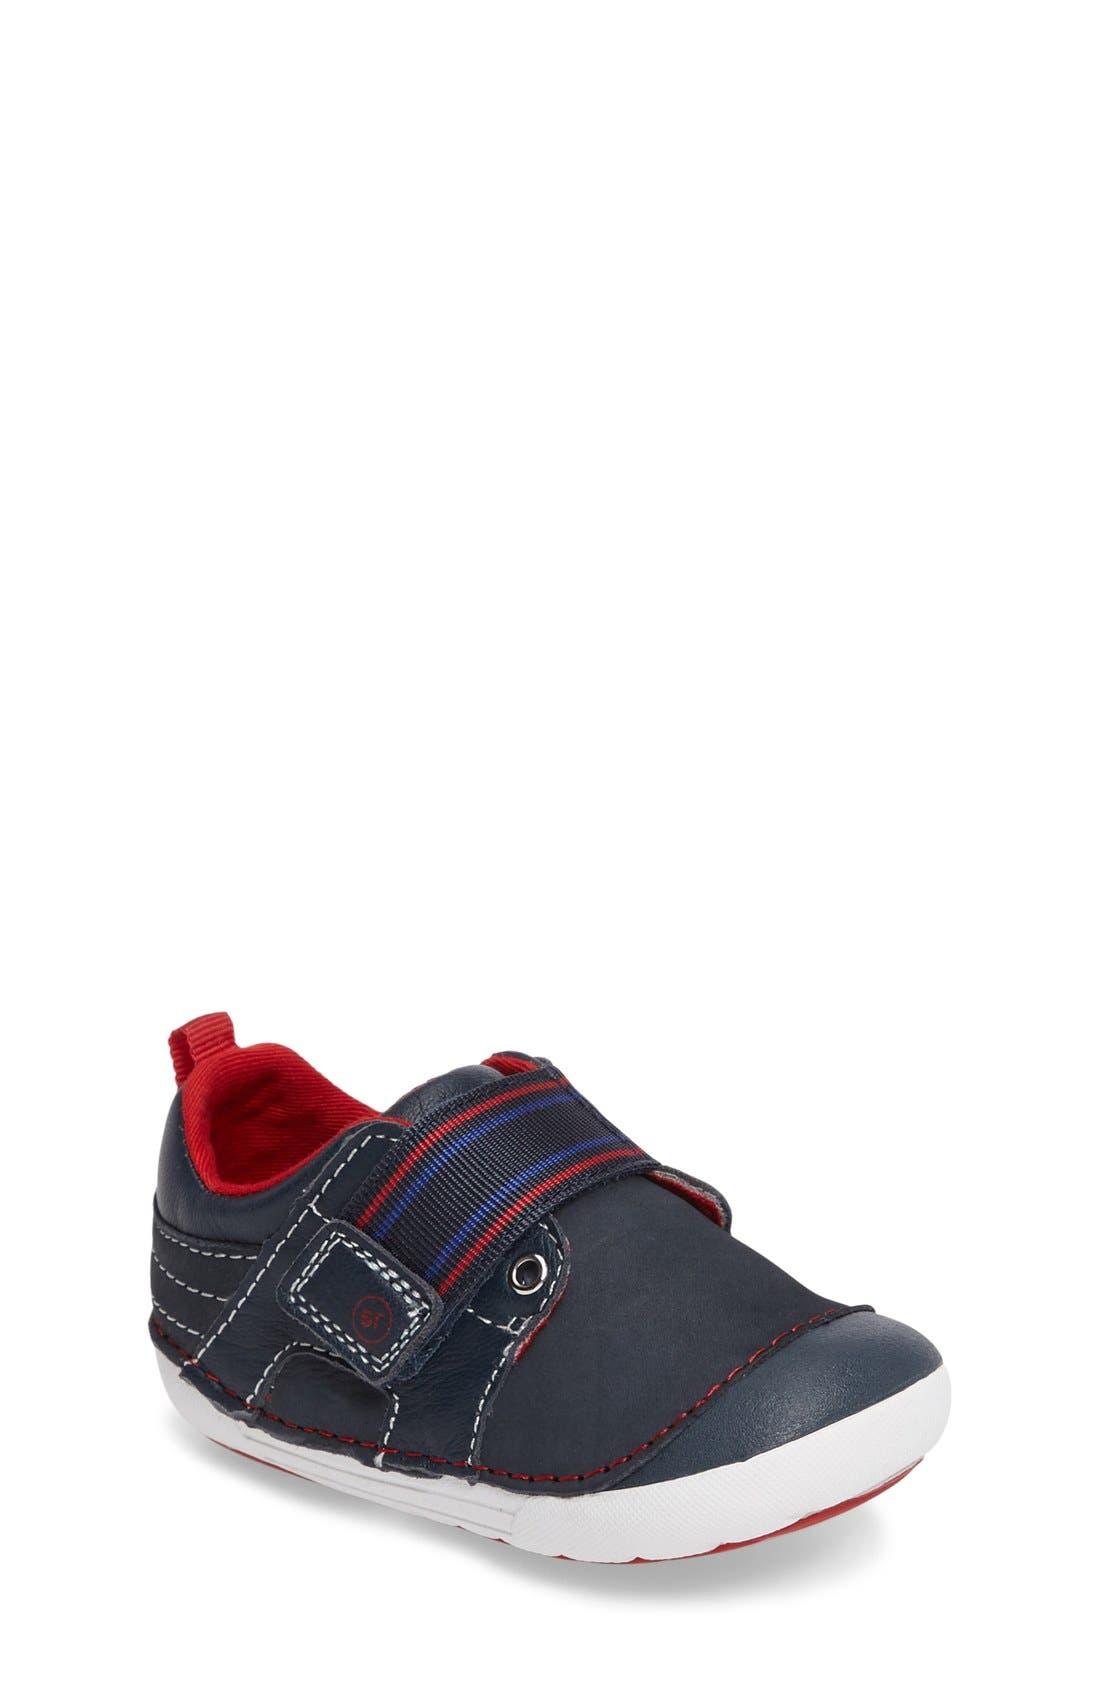 STRIDE RITE Soft Motion™ Cameron Sneaker